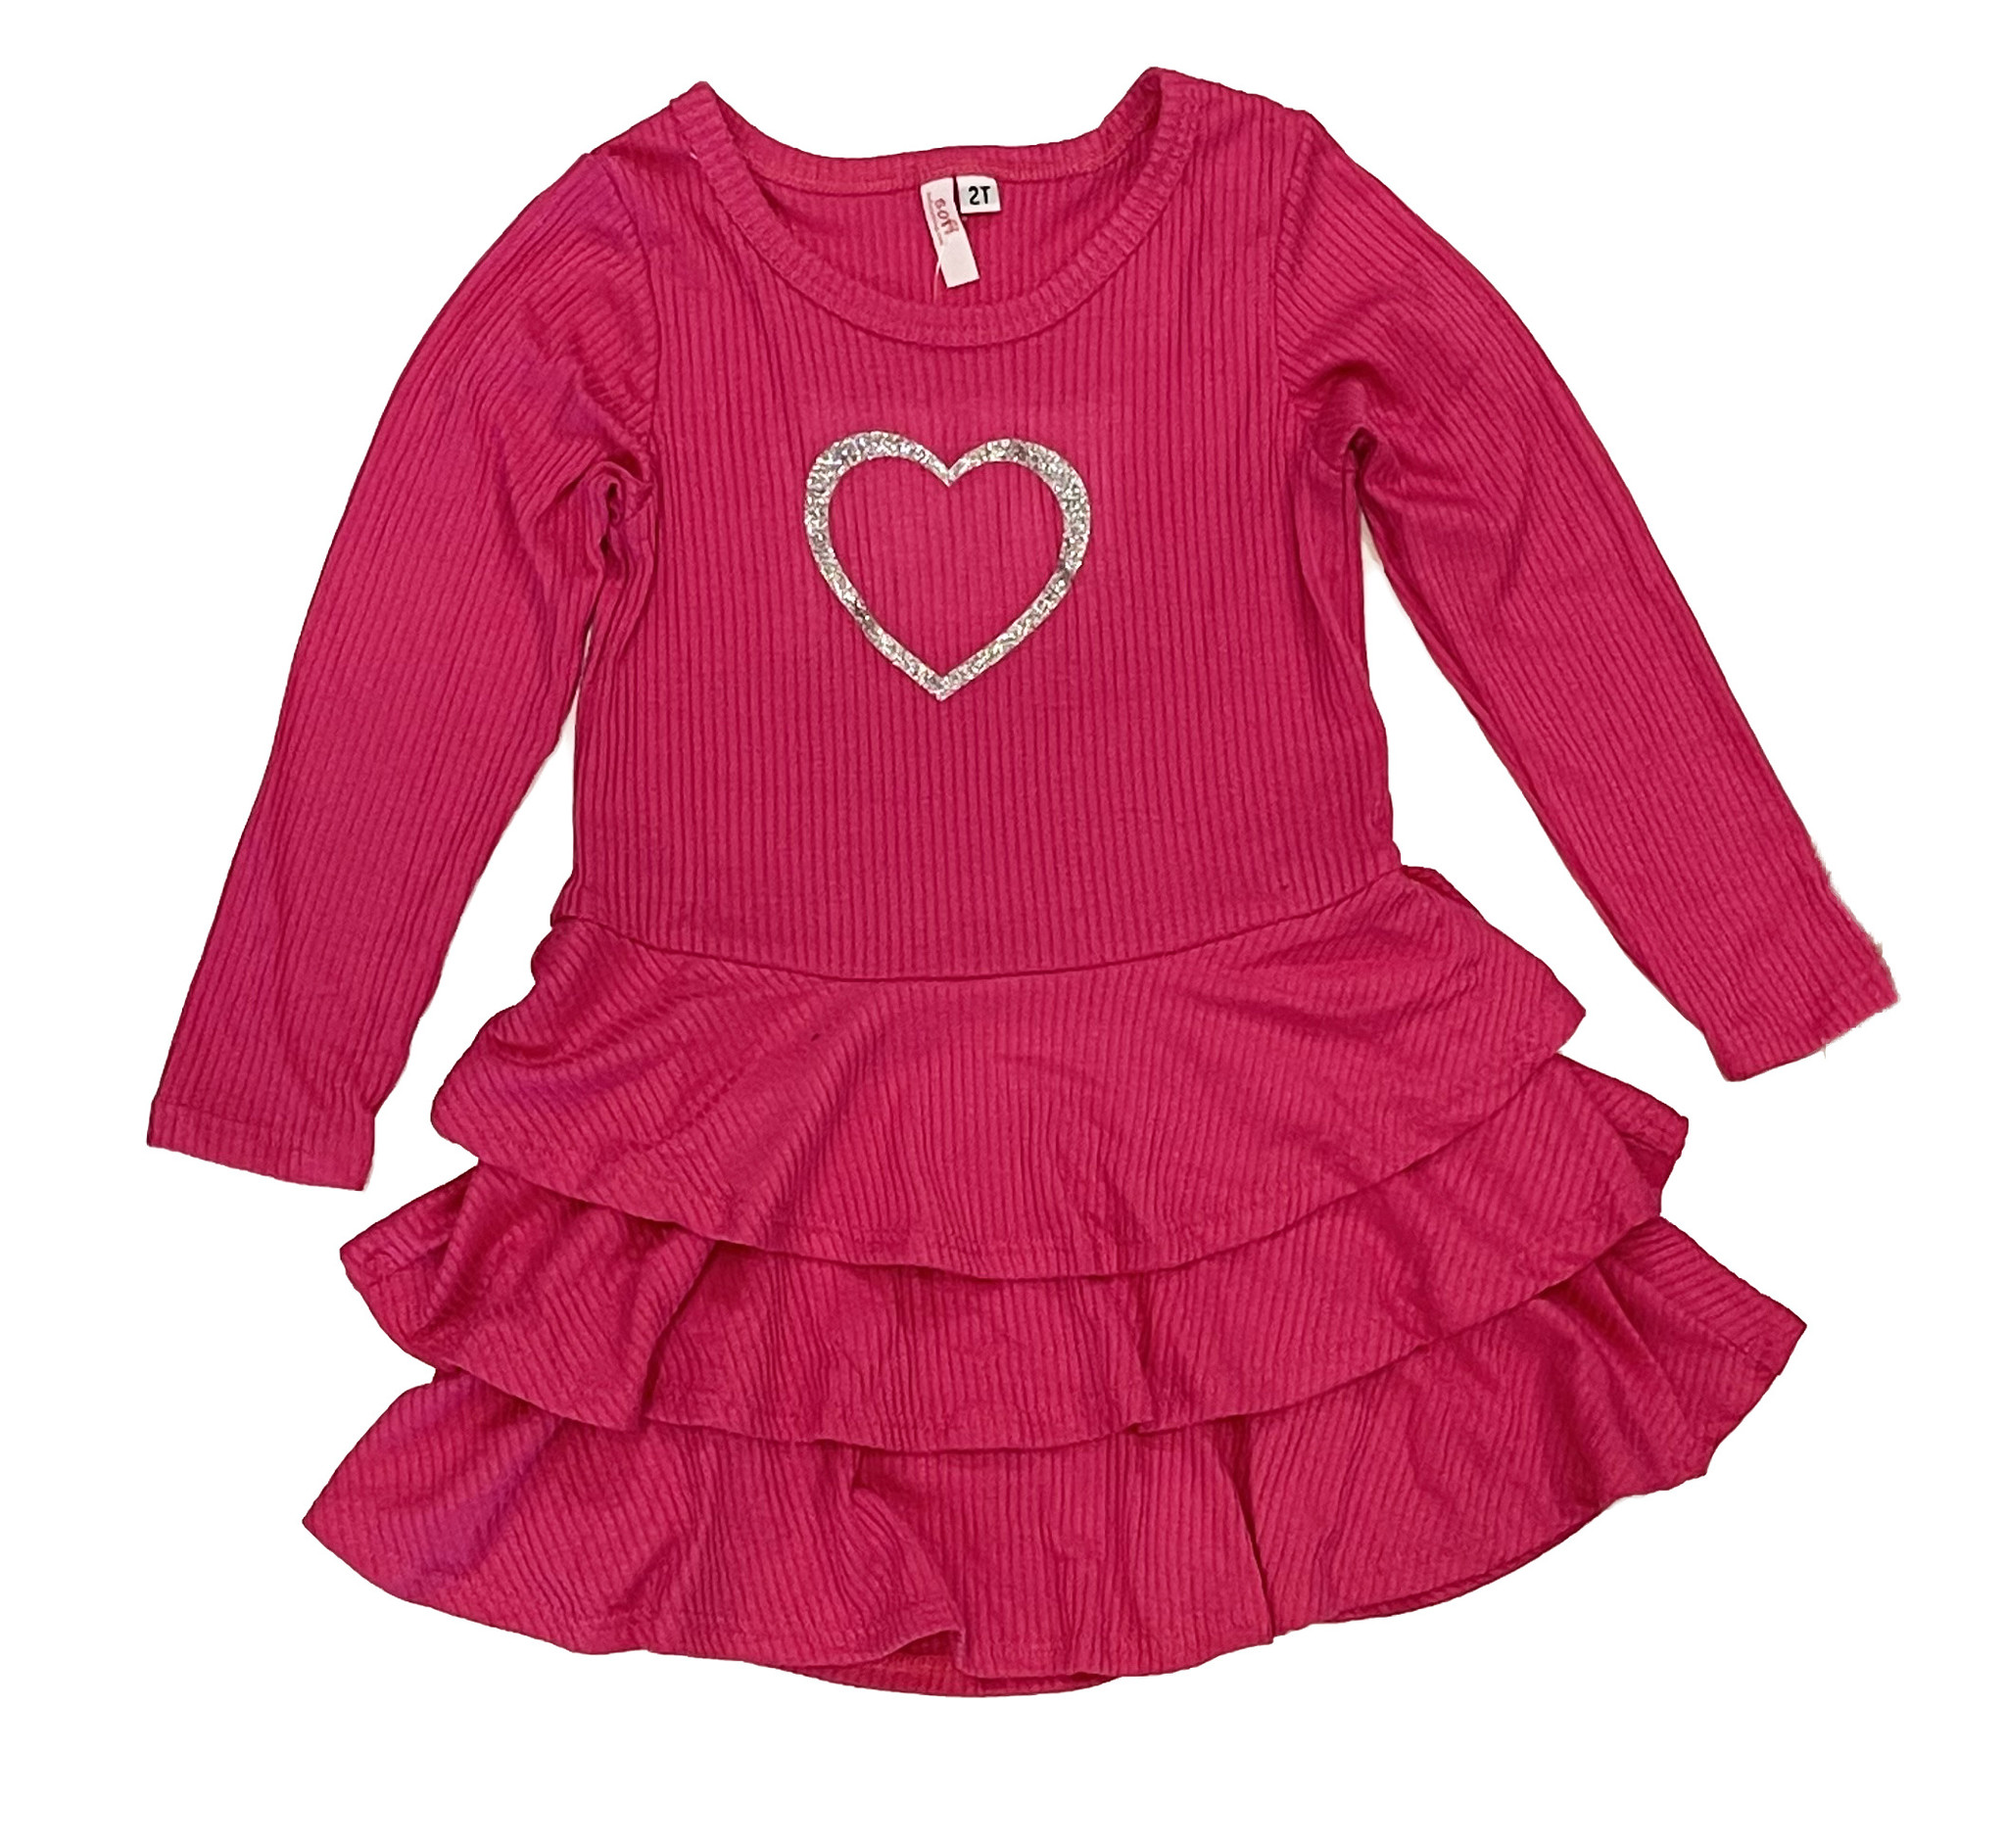 Sofi Fuschia/Silver Heart Dress